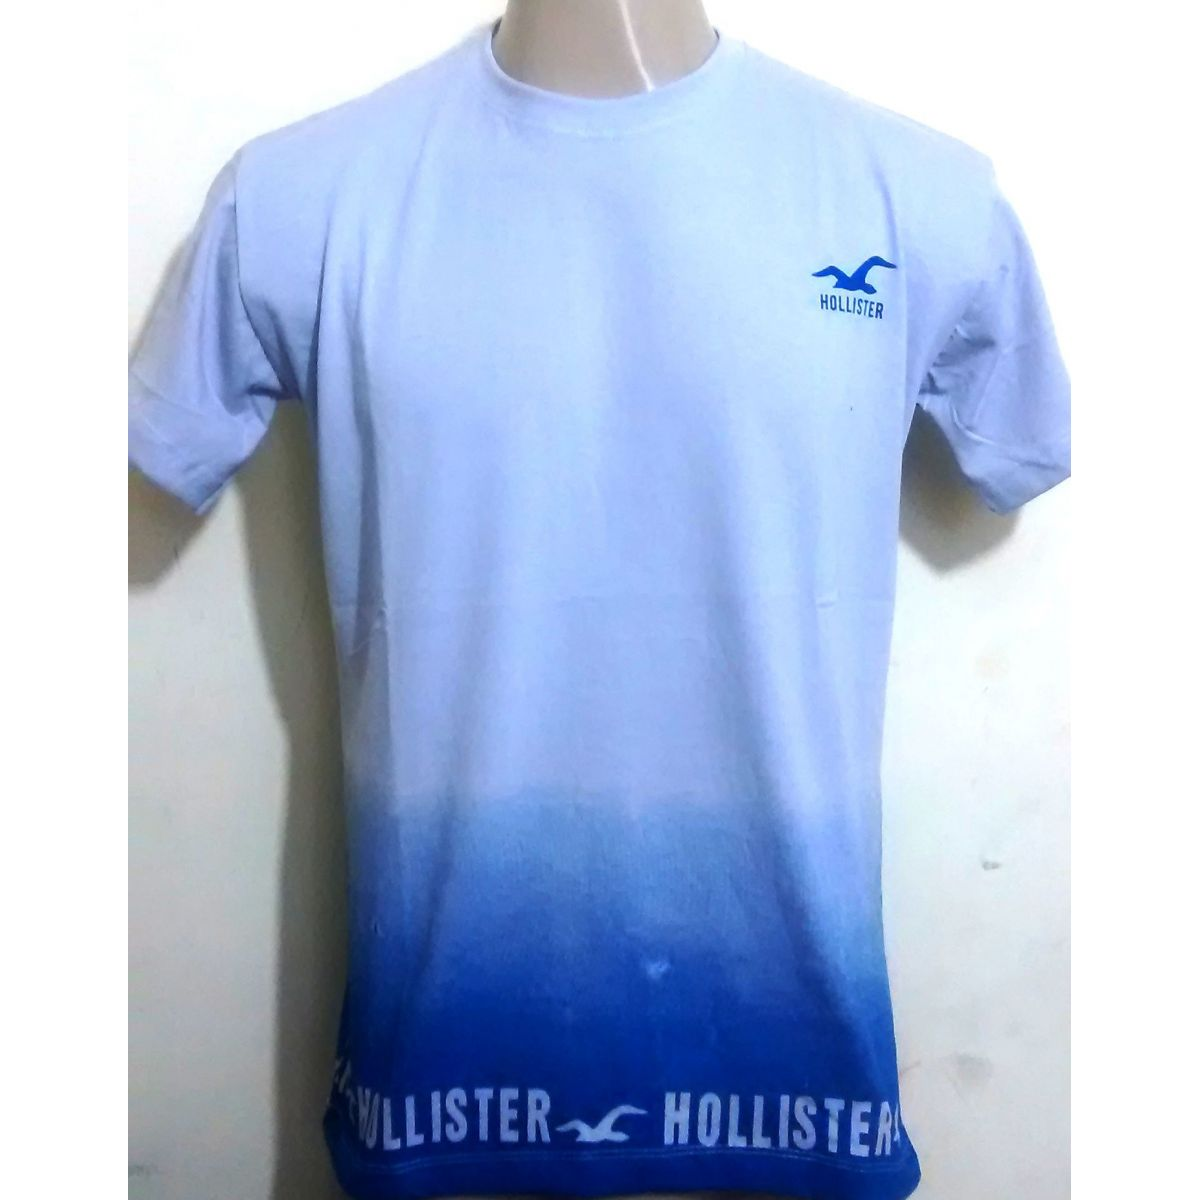 Kit C/10 Camisetas Masculinas Degrade Diversas Marcas